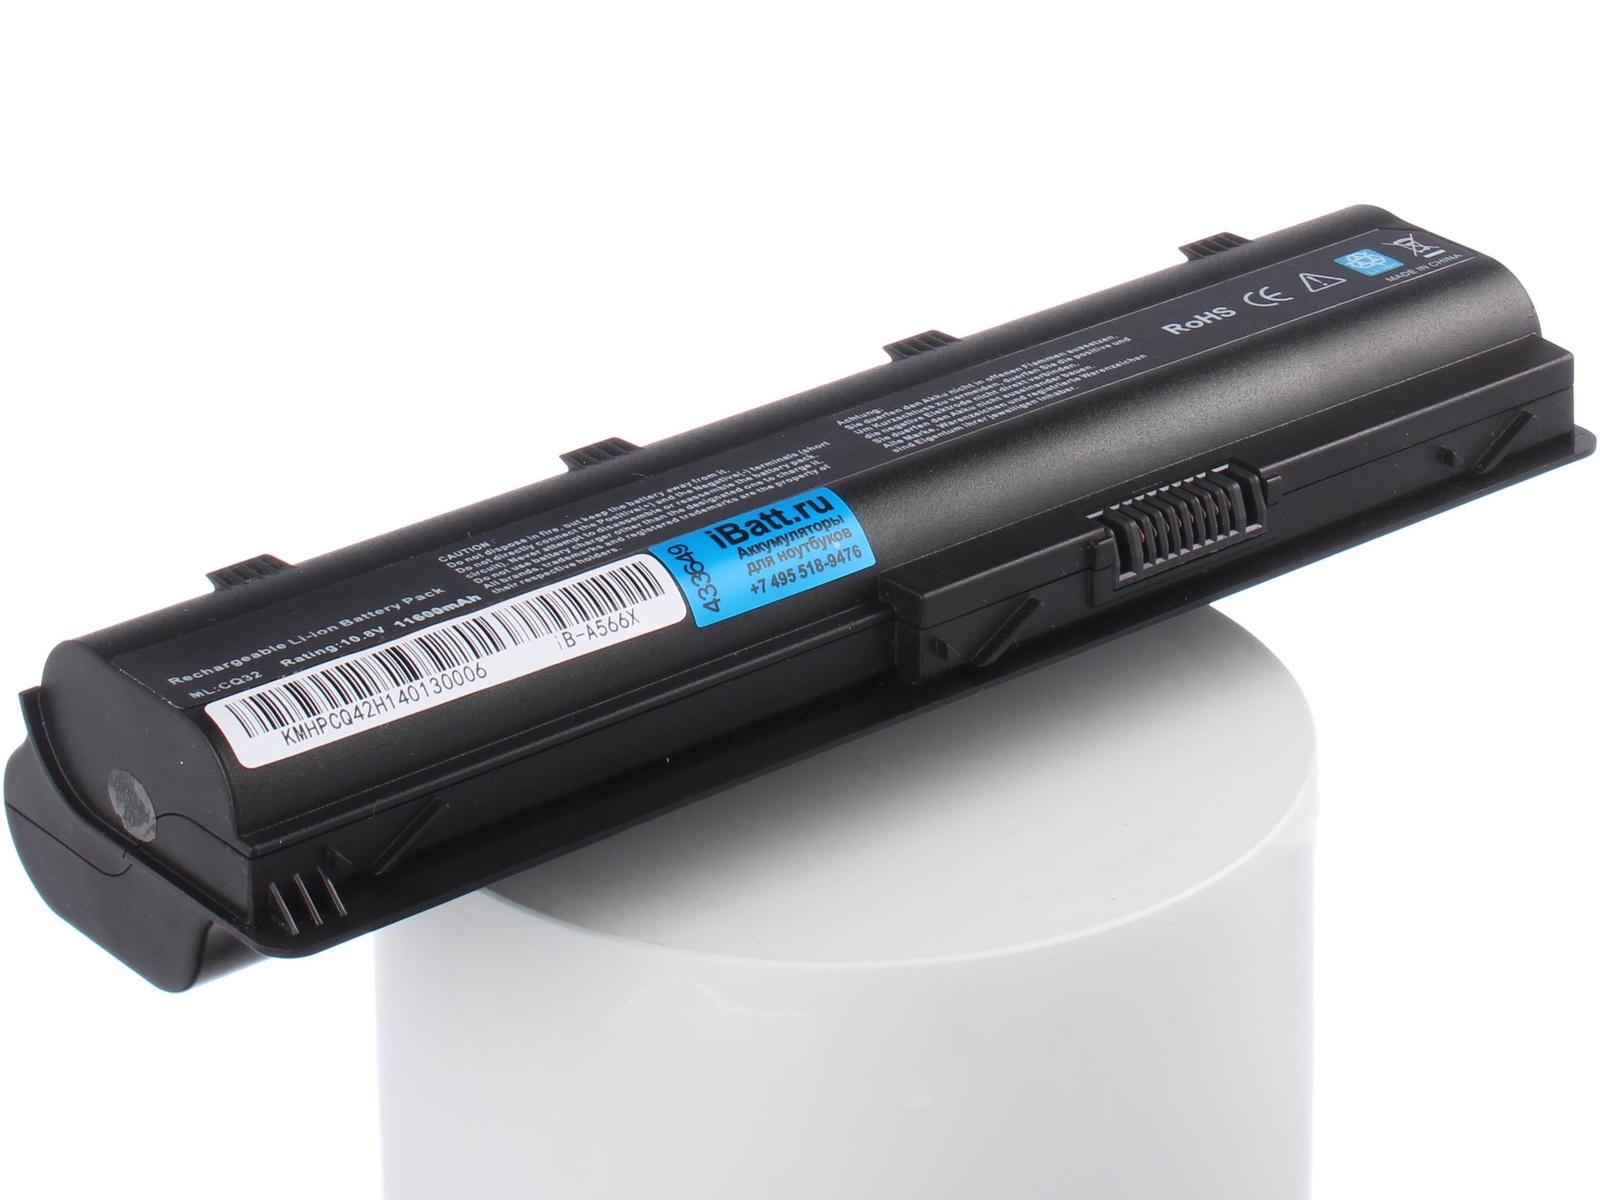 Аккумулятор для ноутбука iBatt для HP-Compaq Pavilion dv6-3300er, Pavilion dv6-3335er, Pavilion dv6-6b17sz, Pavilion dv7-6026sr, Pavilion dv7-6b00er, Pavilion dv7-6c05ev, Pavilion g6-1182sr, Pavilion g6-1209er